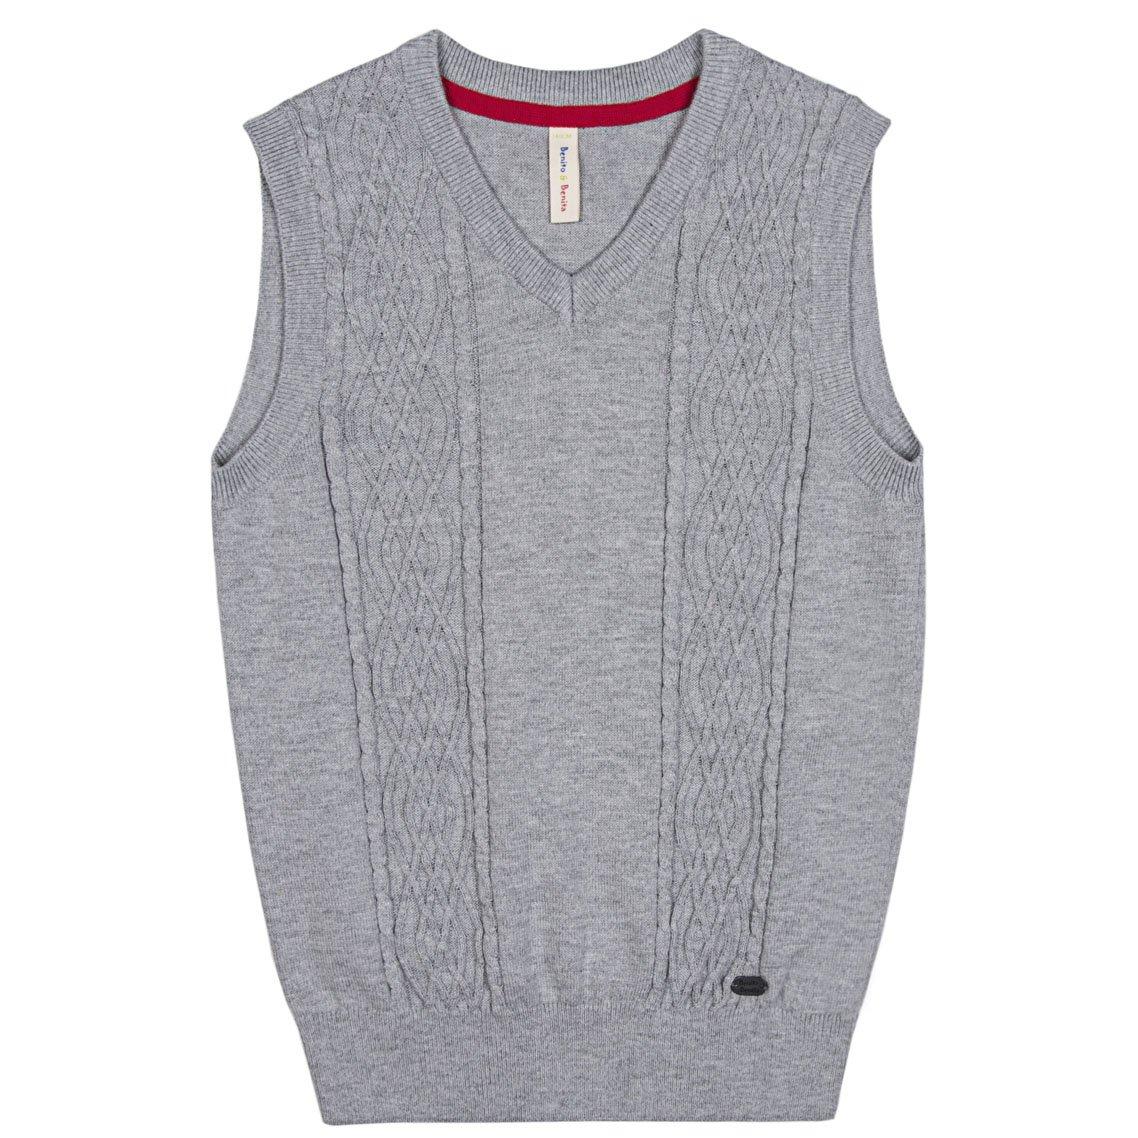 Benito & Benita Boys' Sweater Vest Woolen Cable Uniform Vest Navy (Size 6-16)